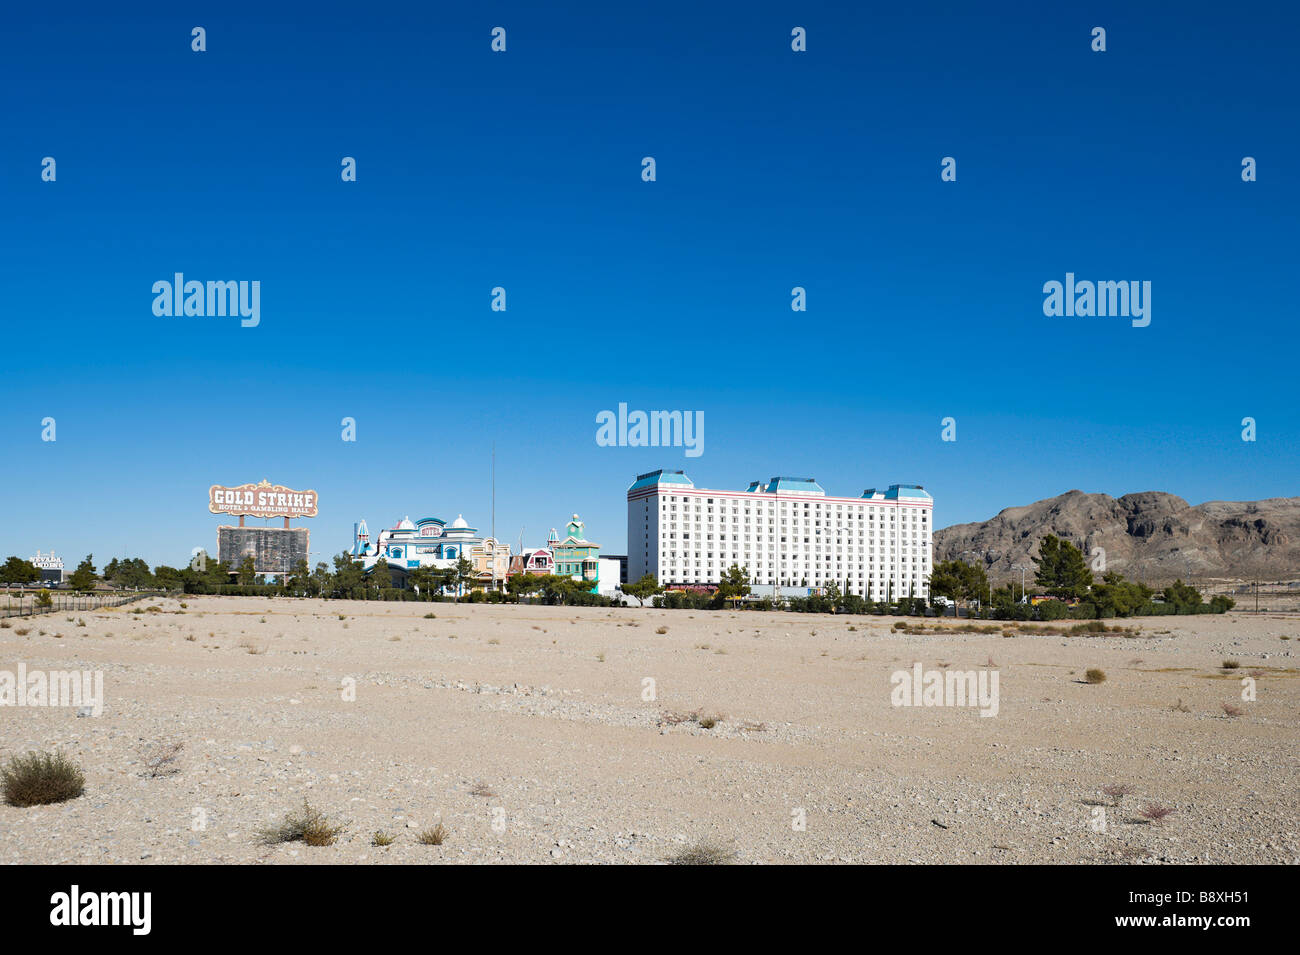 Az gambling nv border casinos gainesville florida